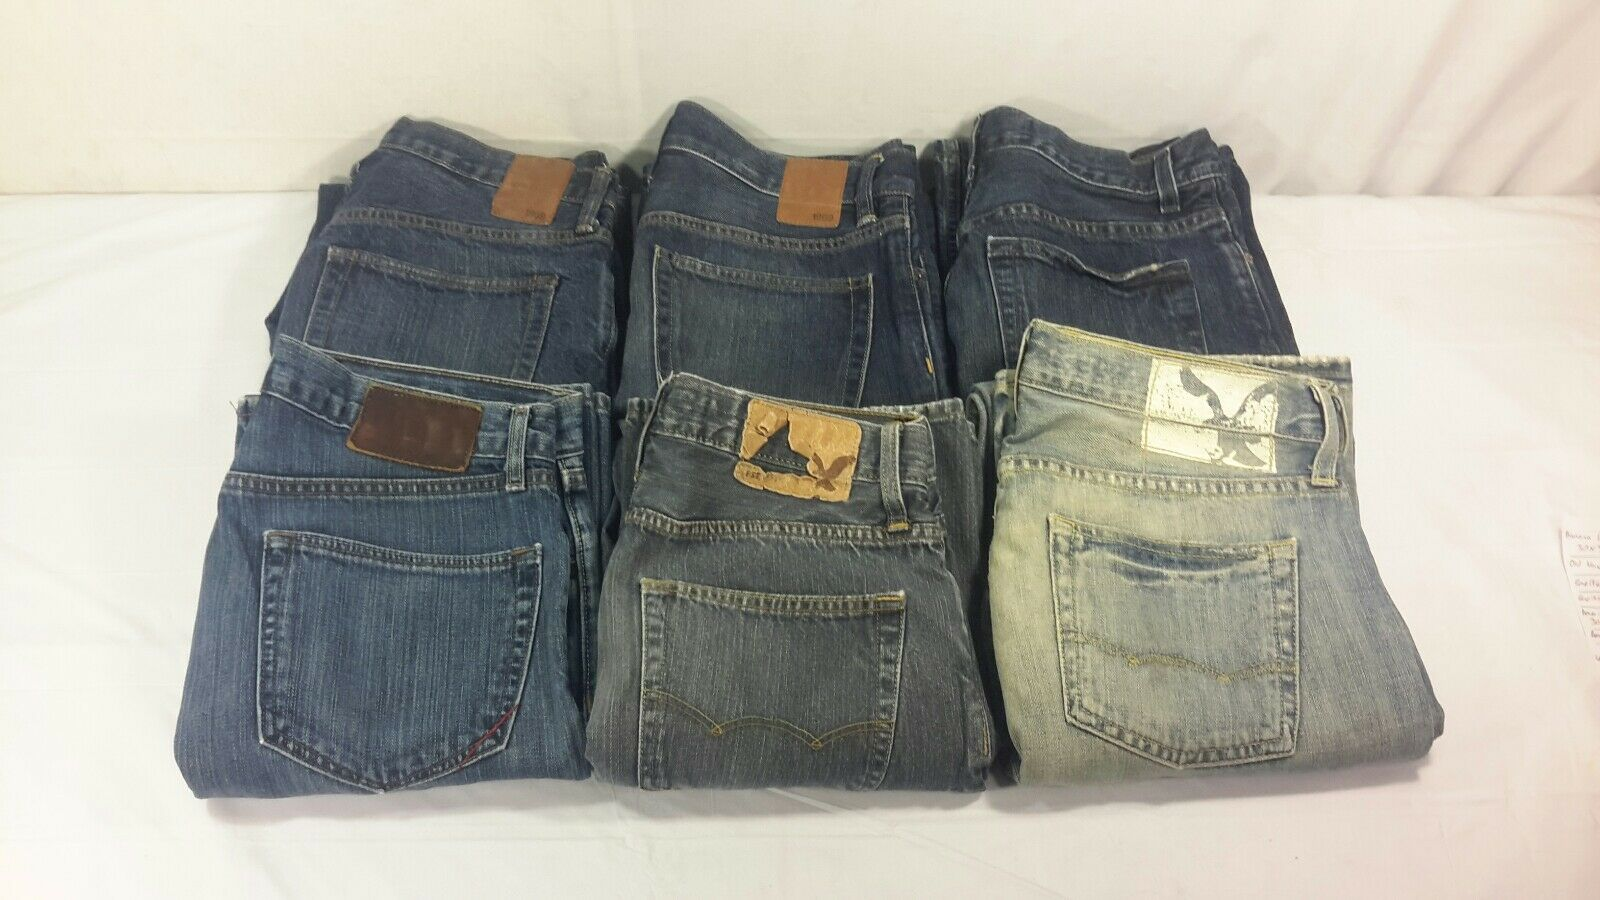 LOT of 6 Mens Designer bluee Jeans Banana Republic Old Navy Gap AE Size 30 x 32